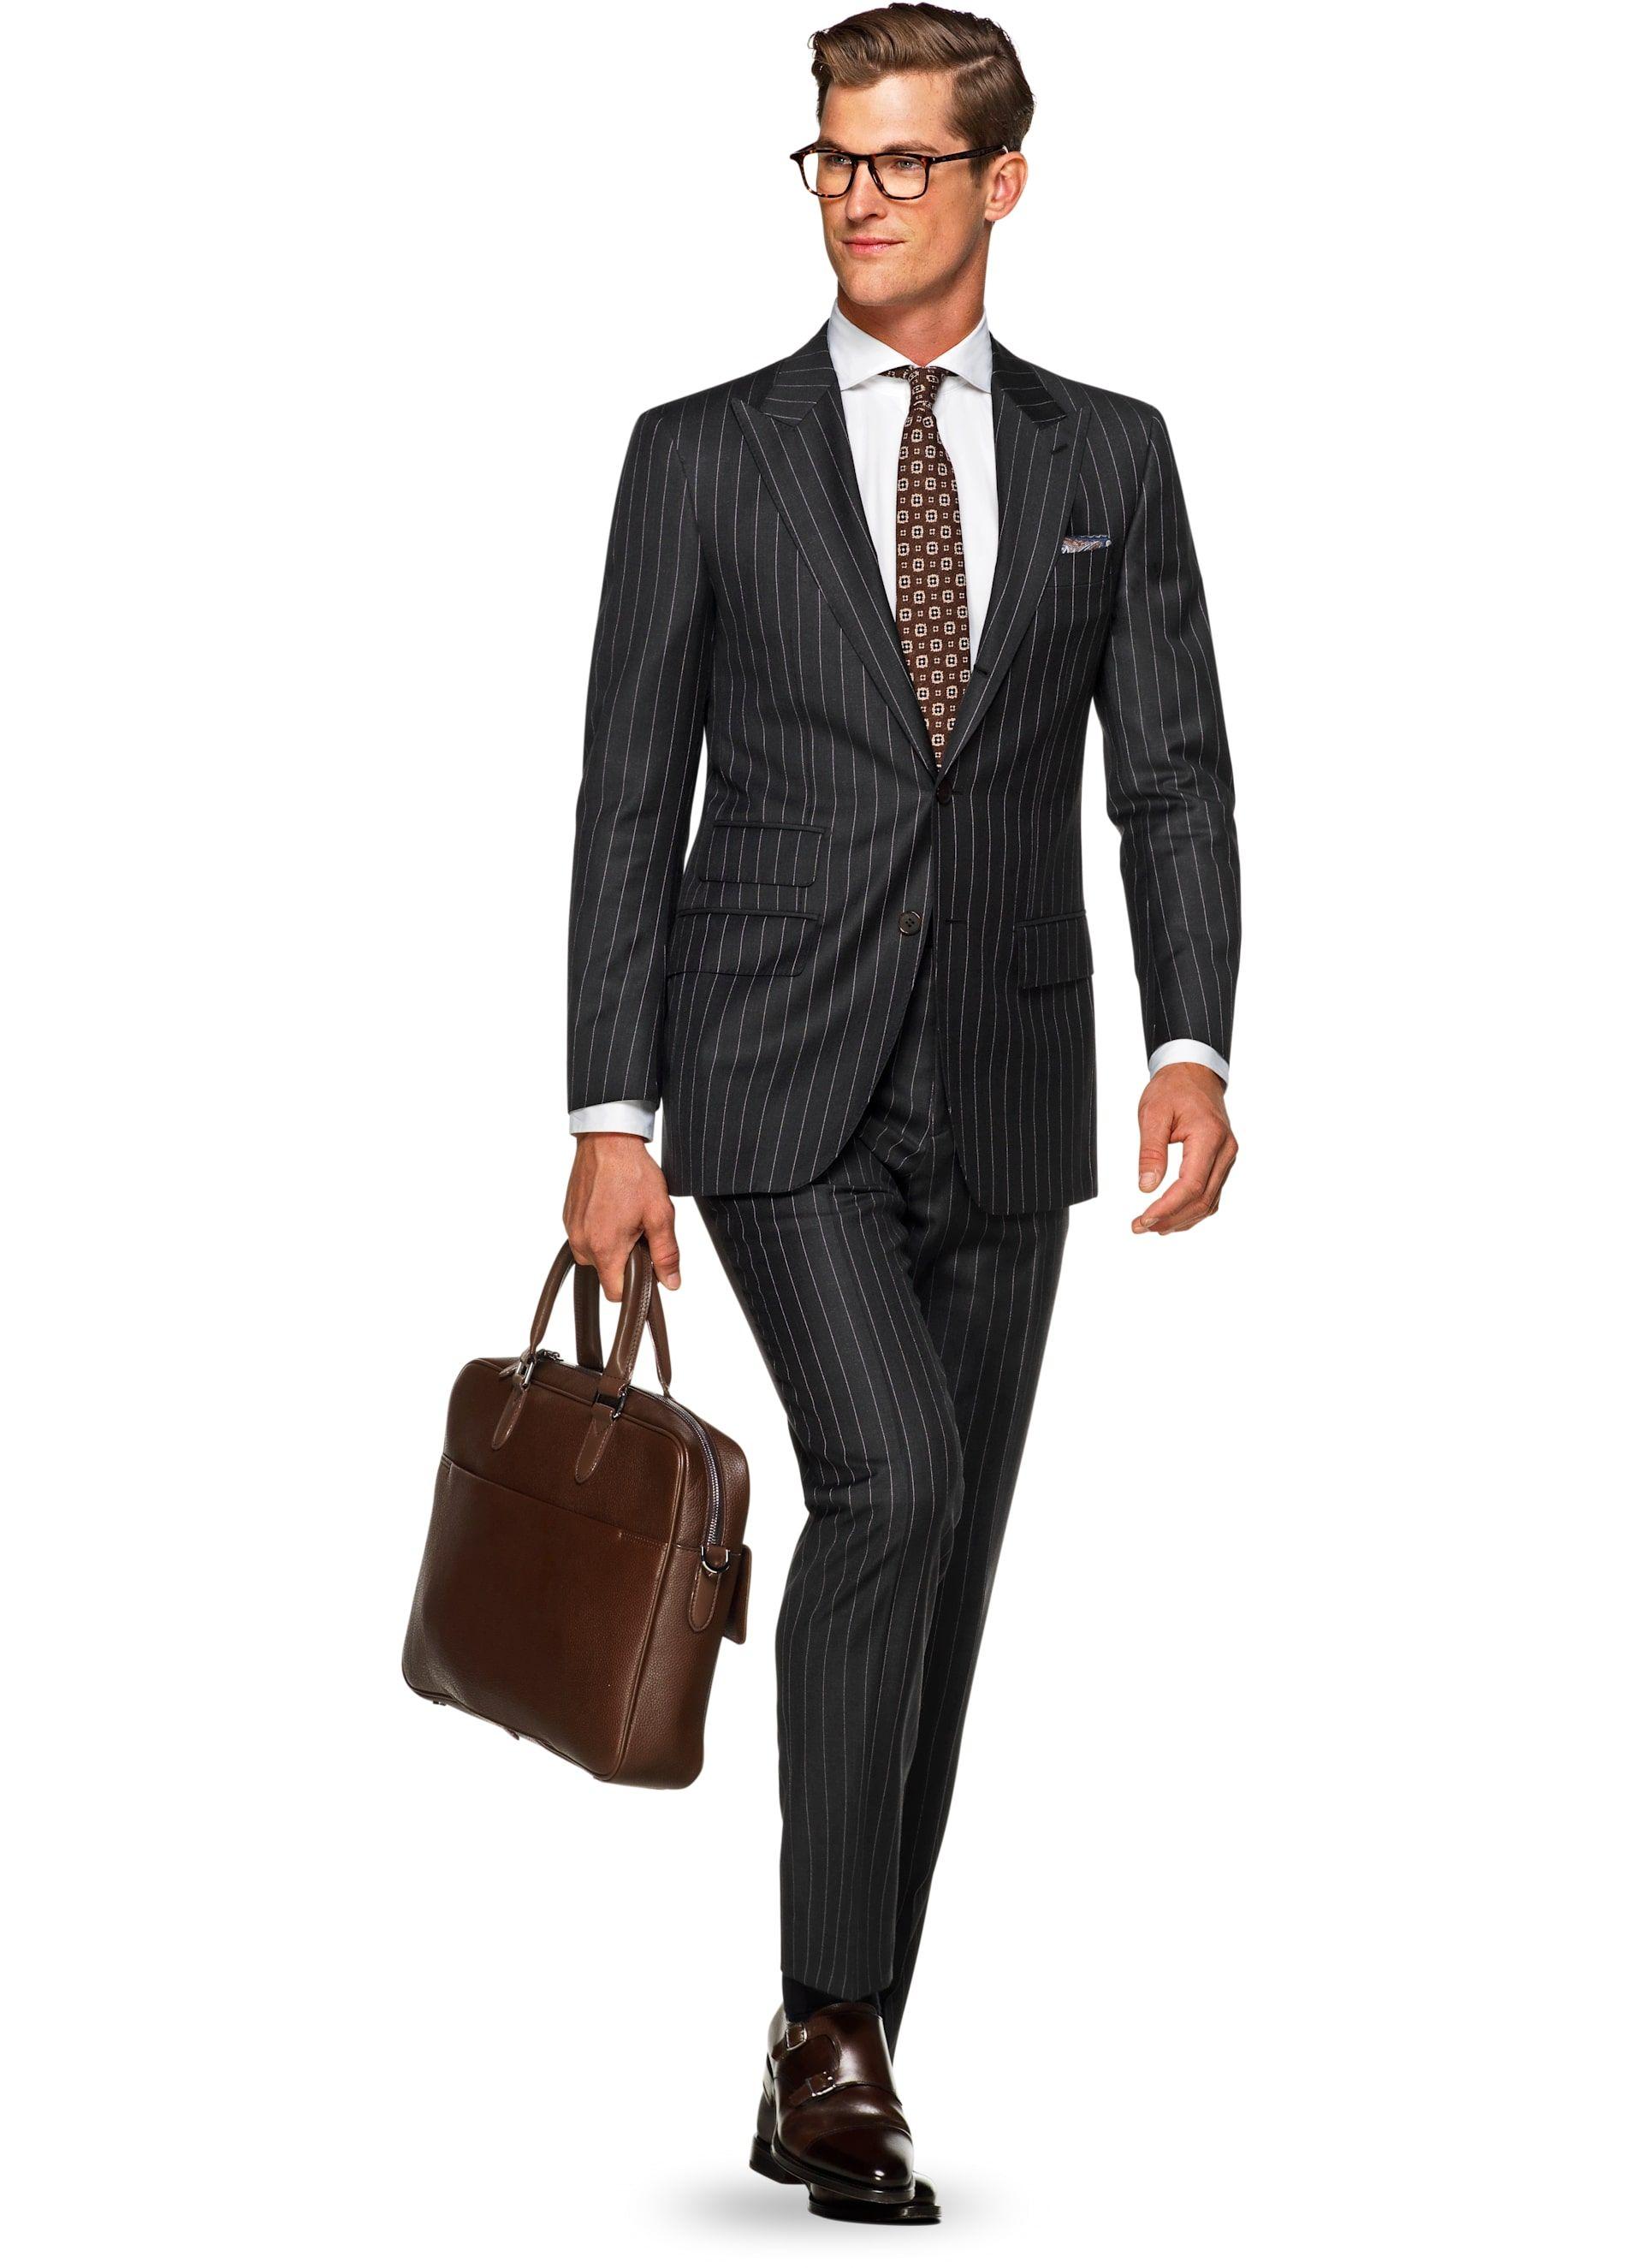 Anzug Grau Streifen Washington P5298 | Suitsupply Online